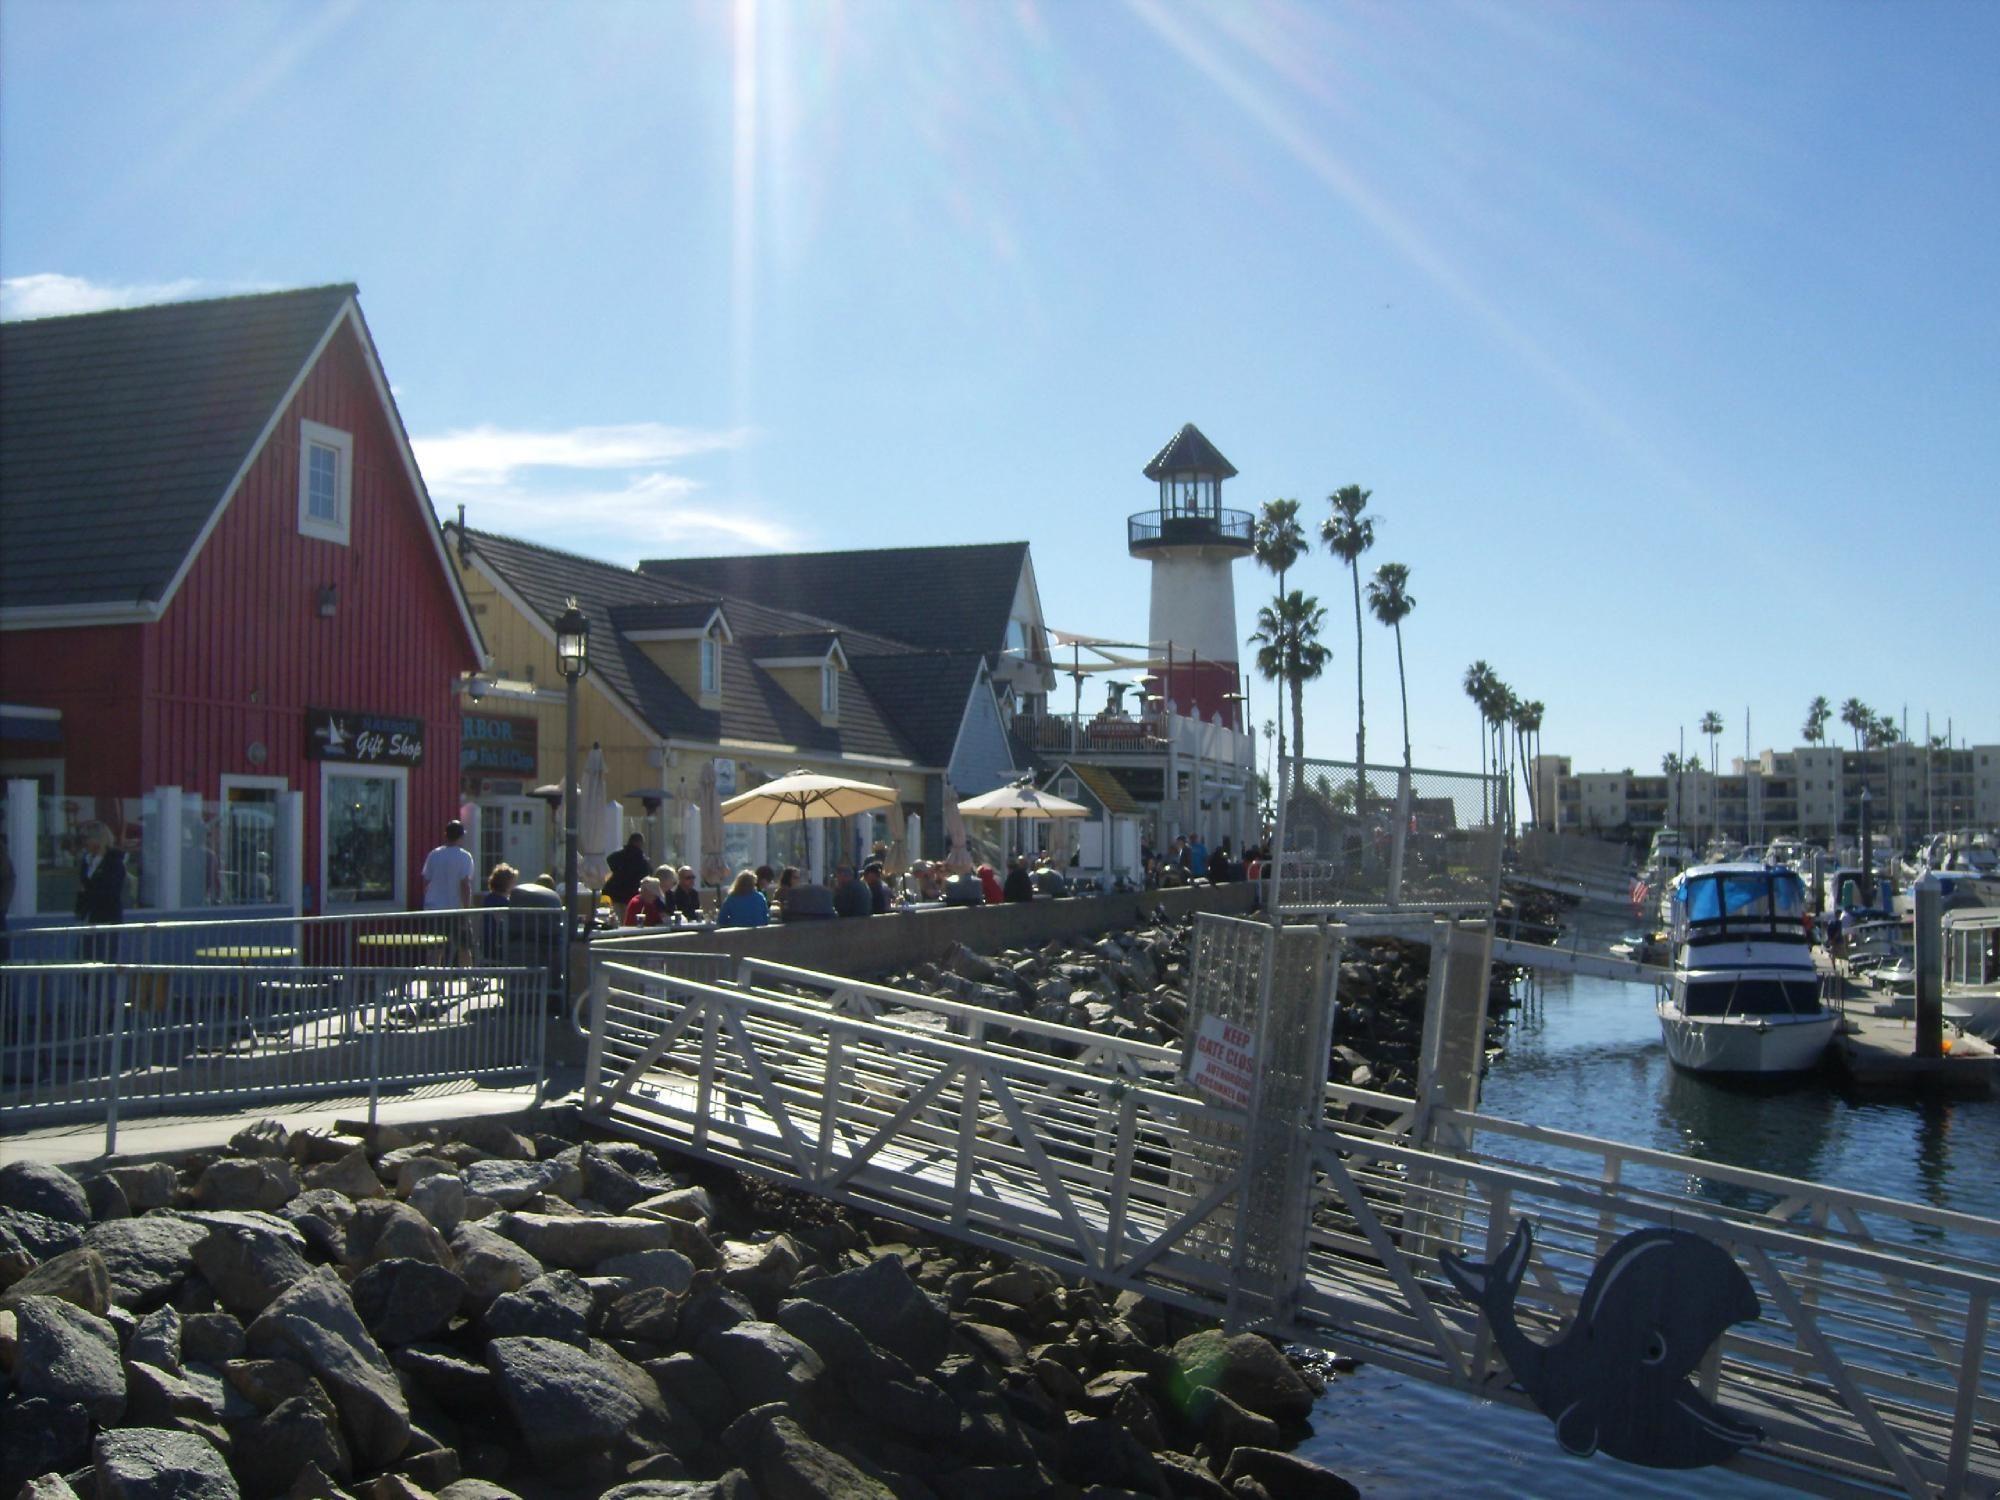 Harbor Fish And Chips Oceanside Harbor Oceanside California